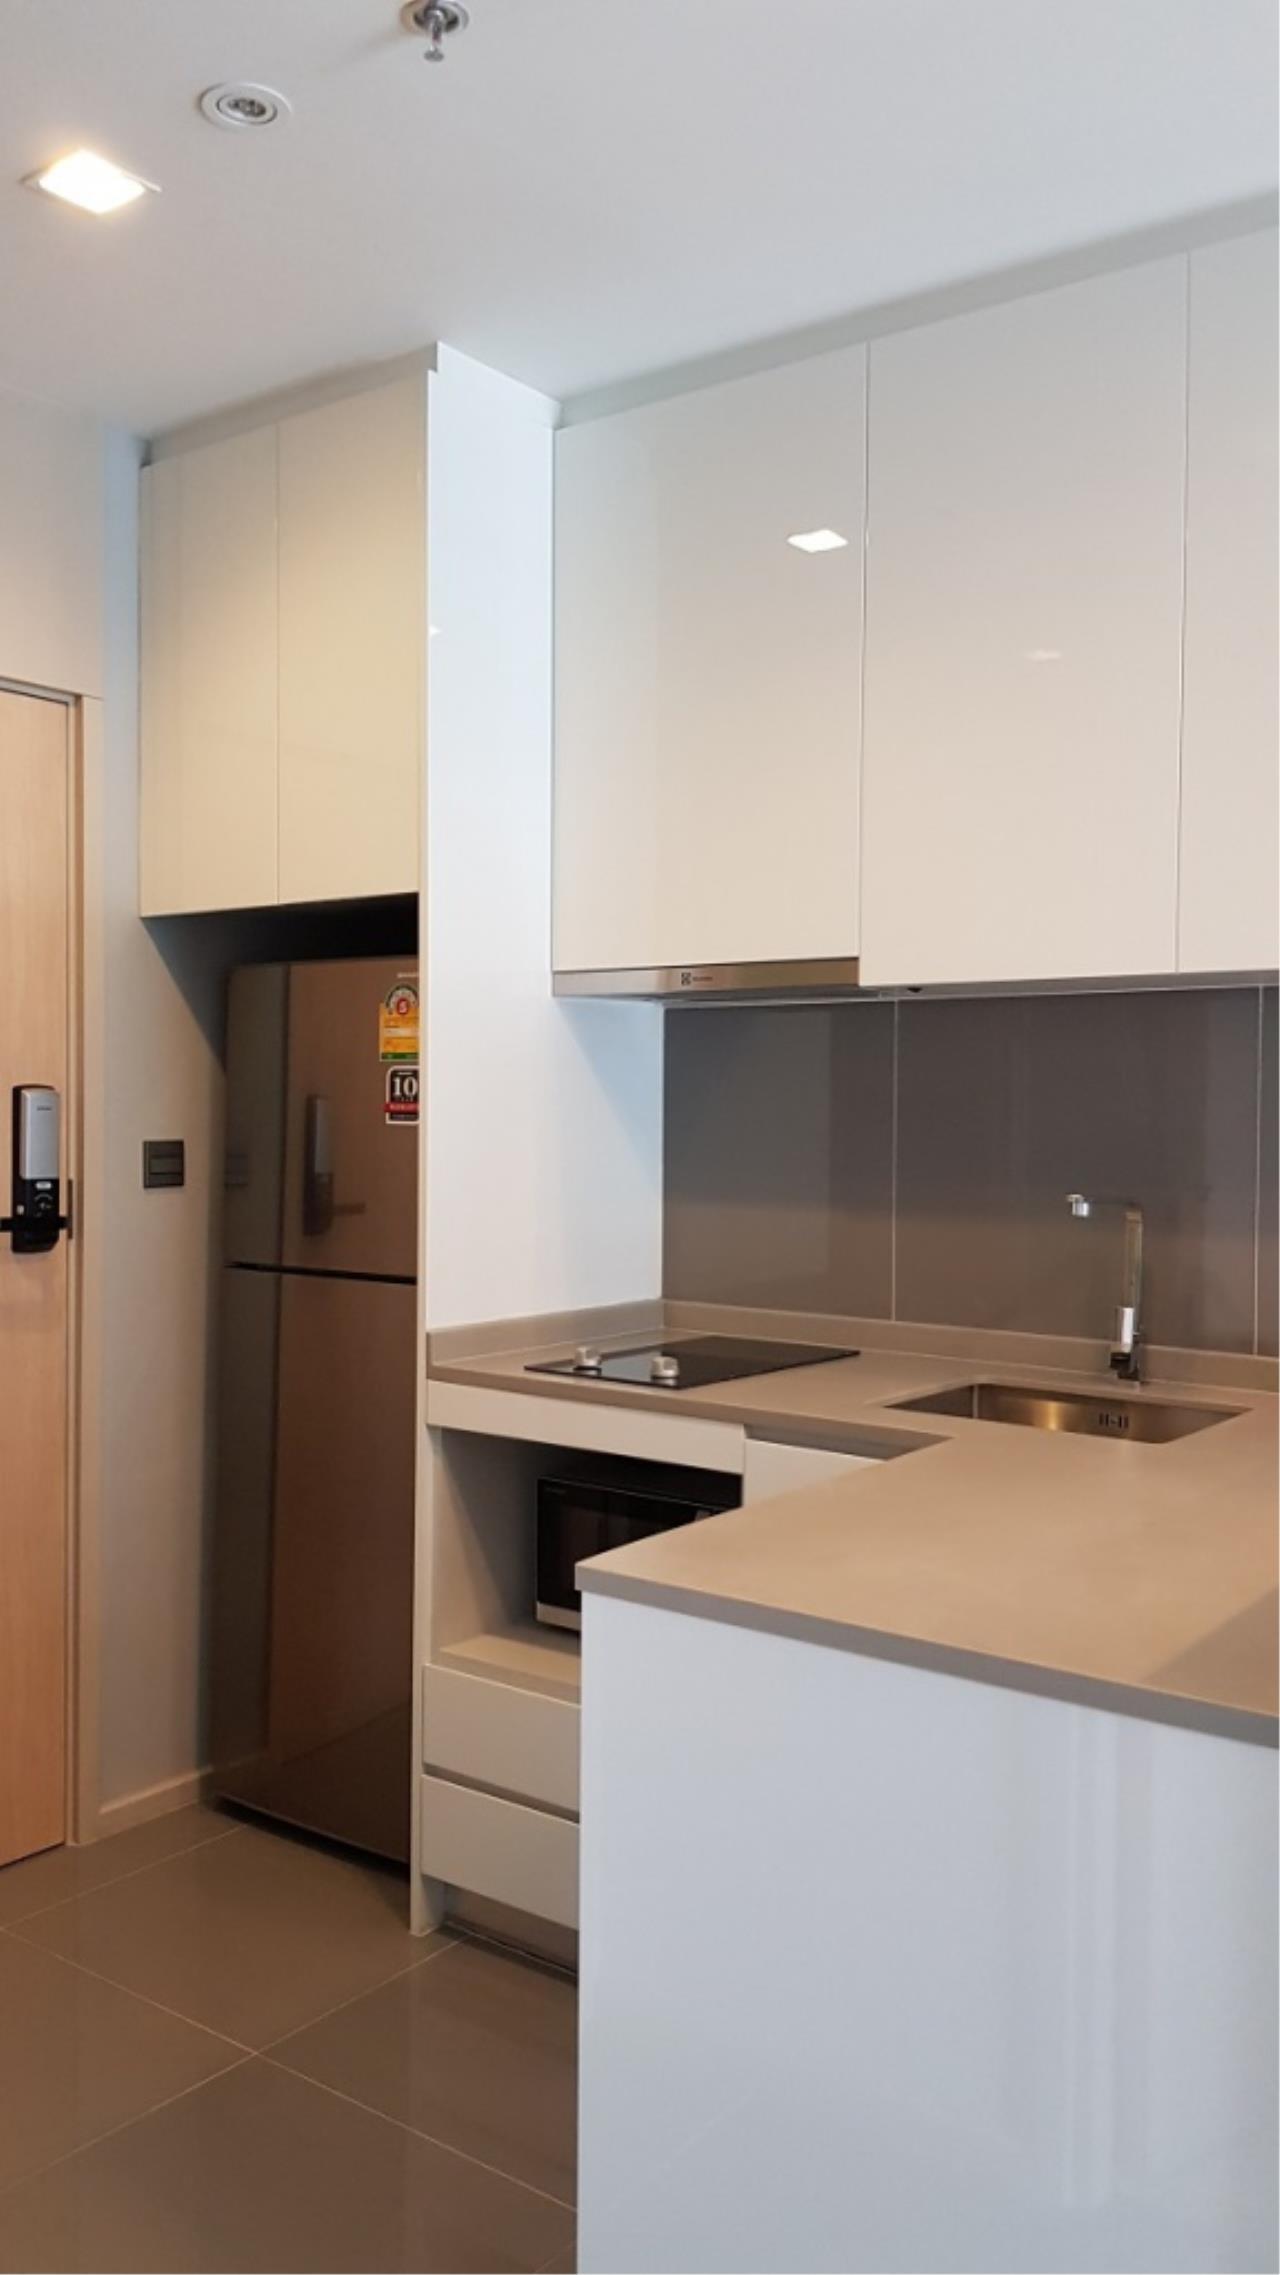 Century21 Skylux Agency's M Thonglor 10 / Condo For Rent / 1 Bedroom / 32 SQM / BTS Thong Lo / Bangkok 6